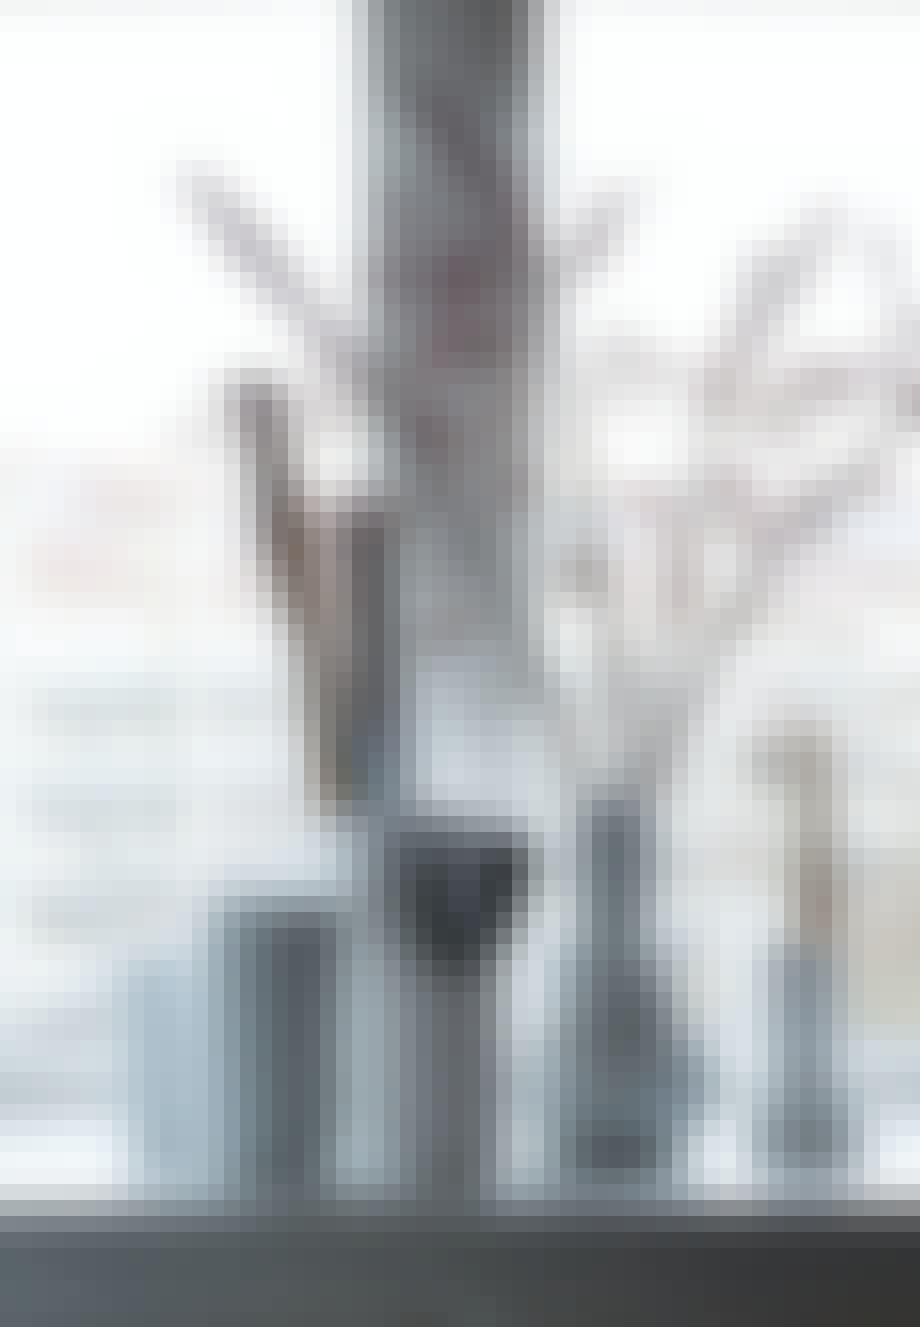 Samling af Lyngbyvaser og vaser fra Finnsdottir